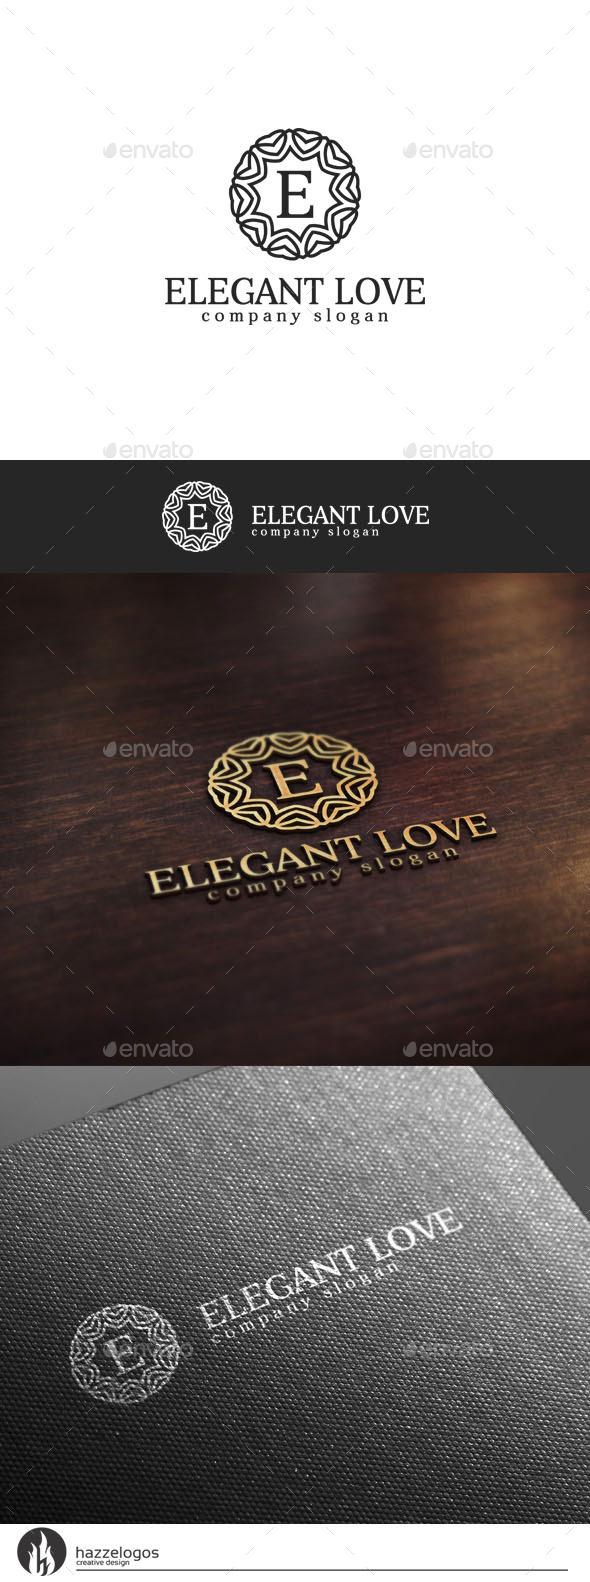 GraphicRiver Elegant Love V2 Logo 10536664